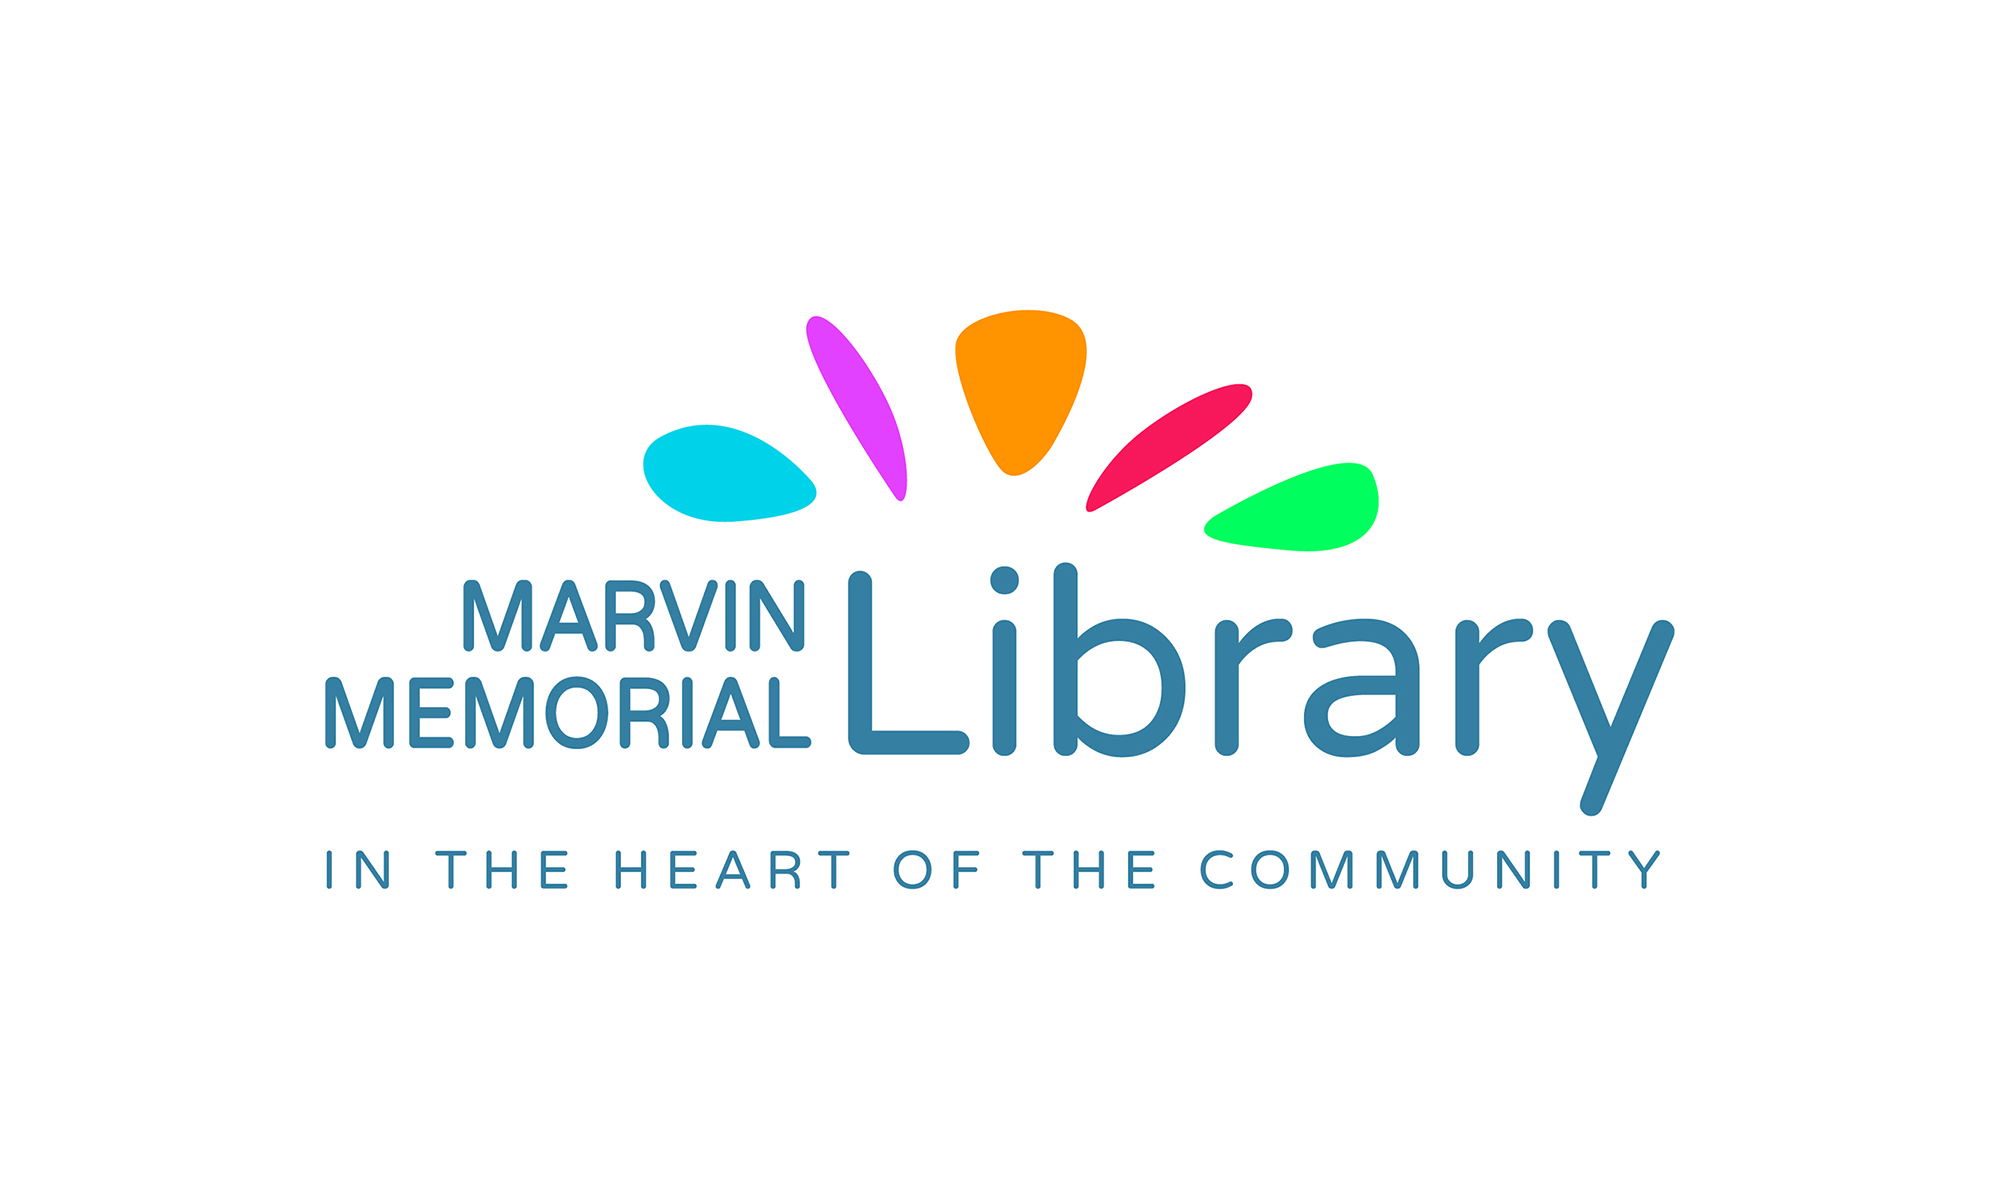 Marvin Memorial Library